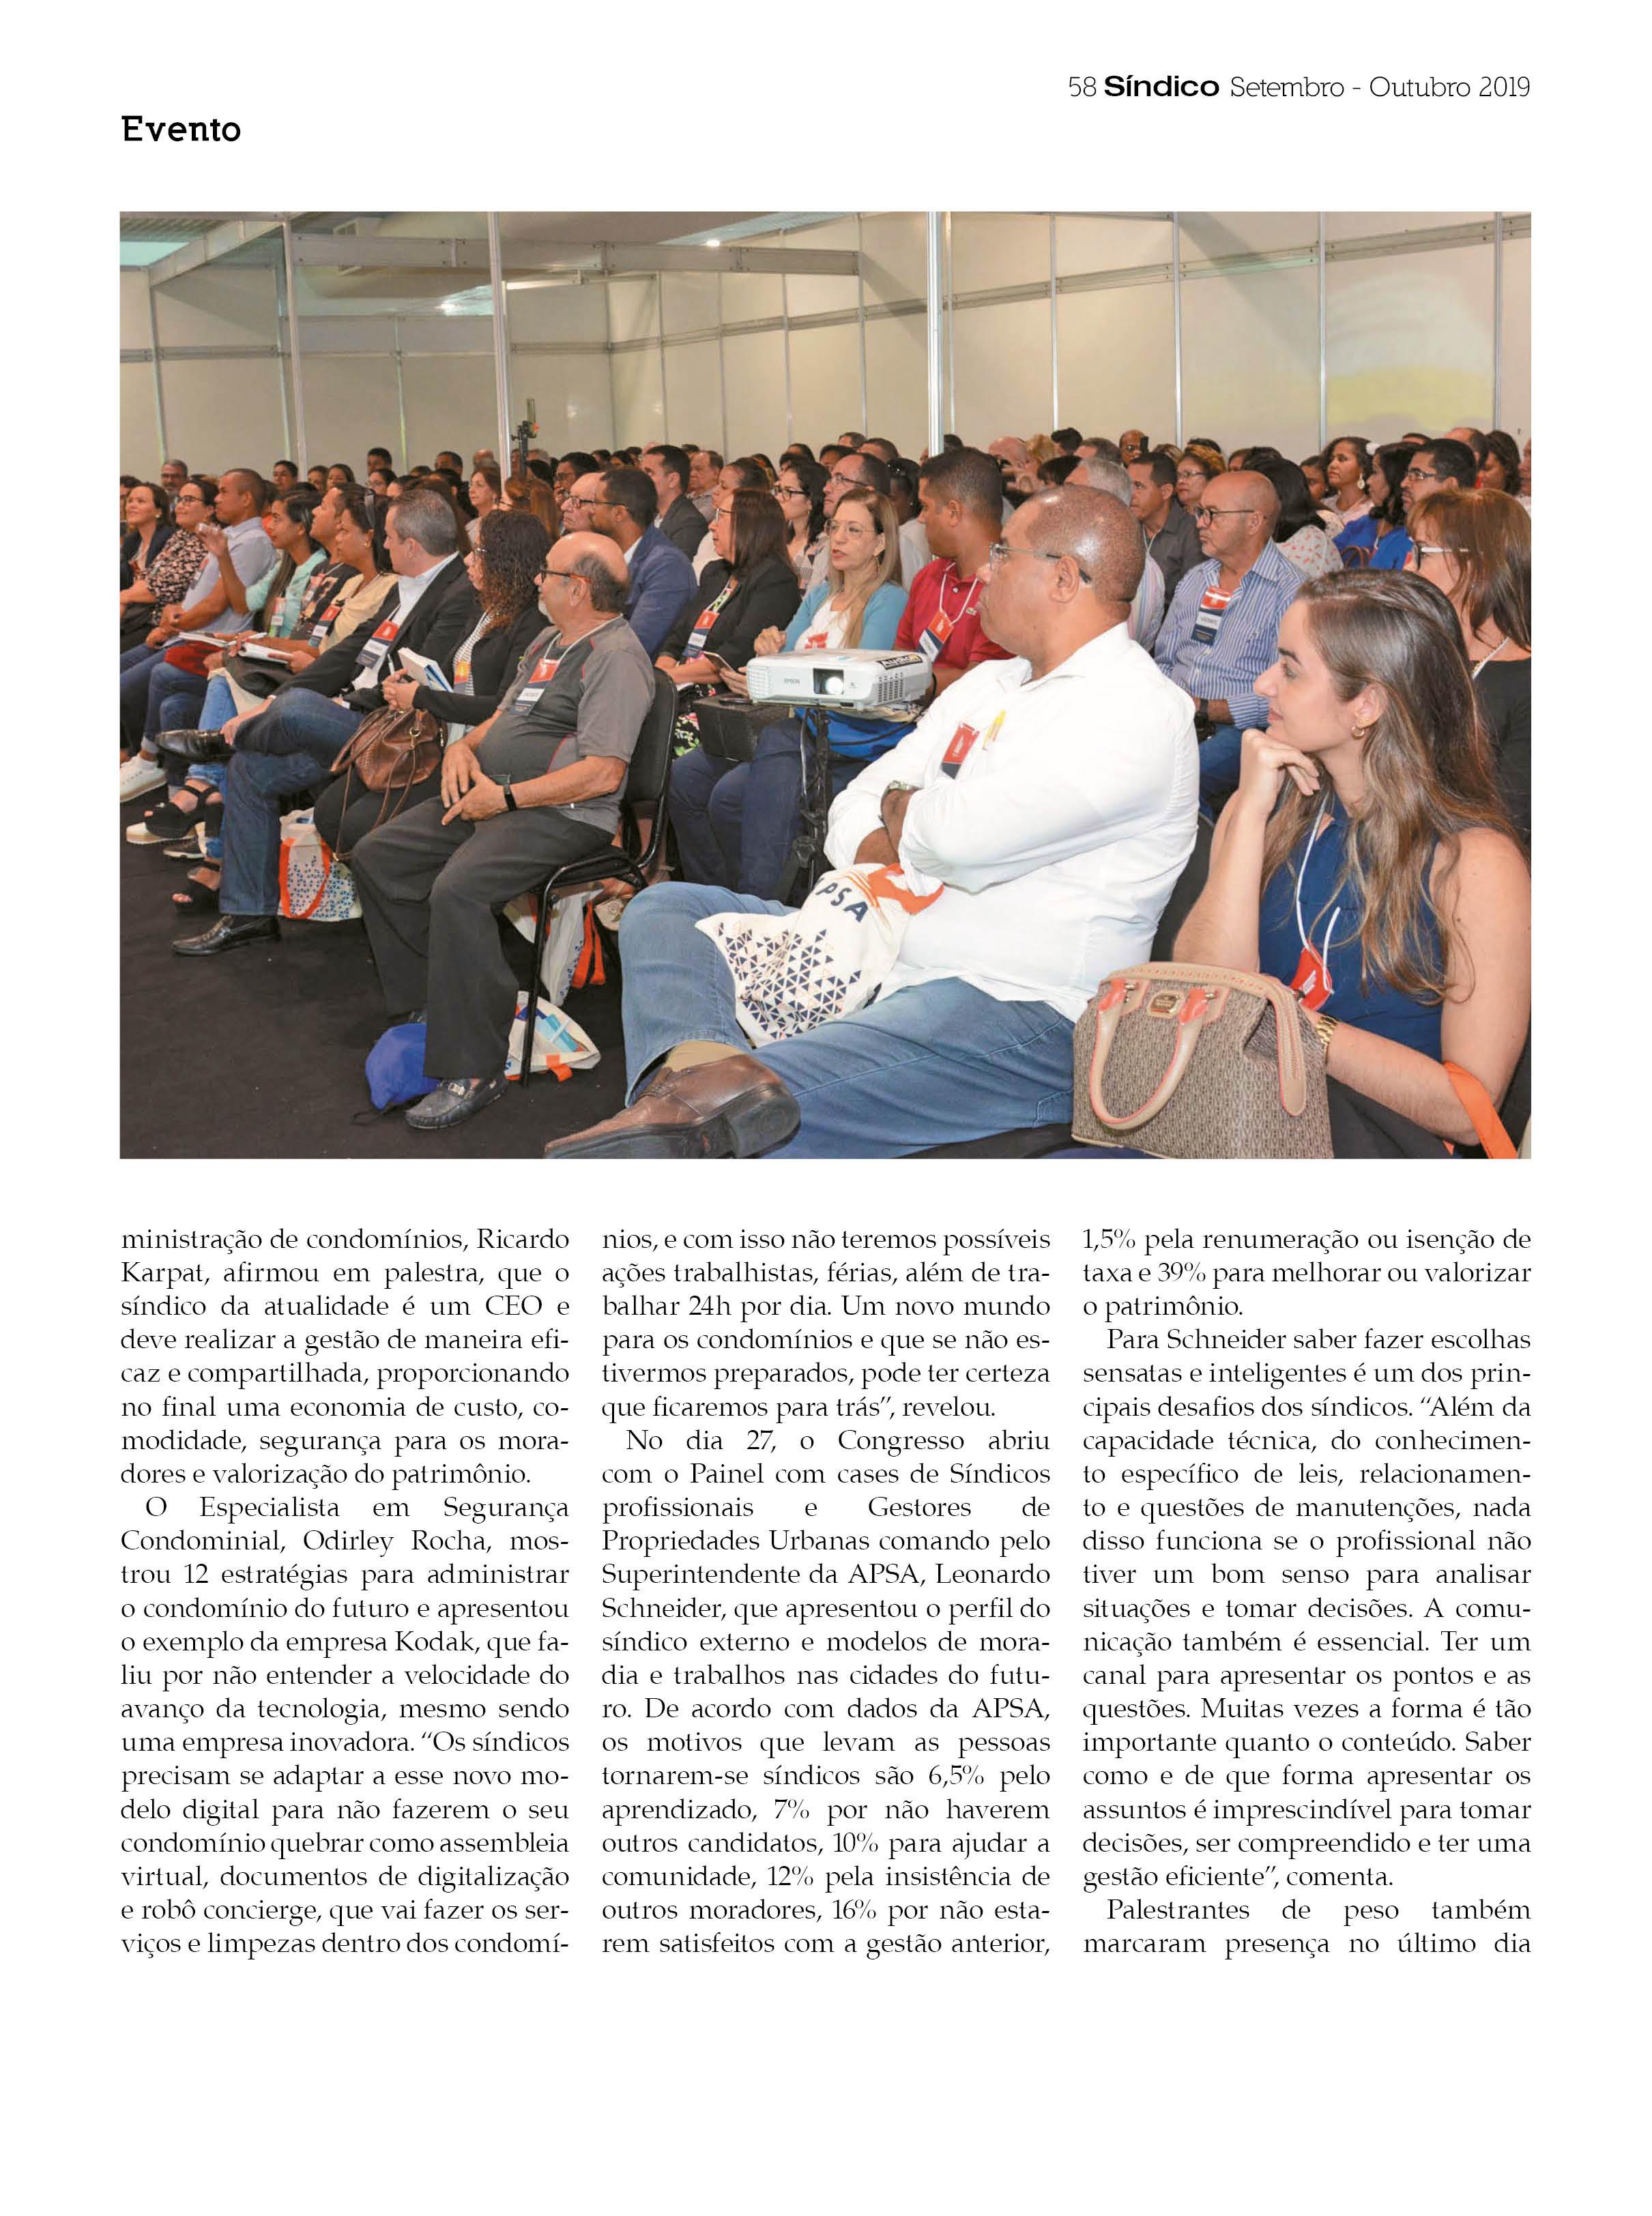 Revista Síndico_ed 246_56